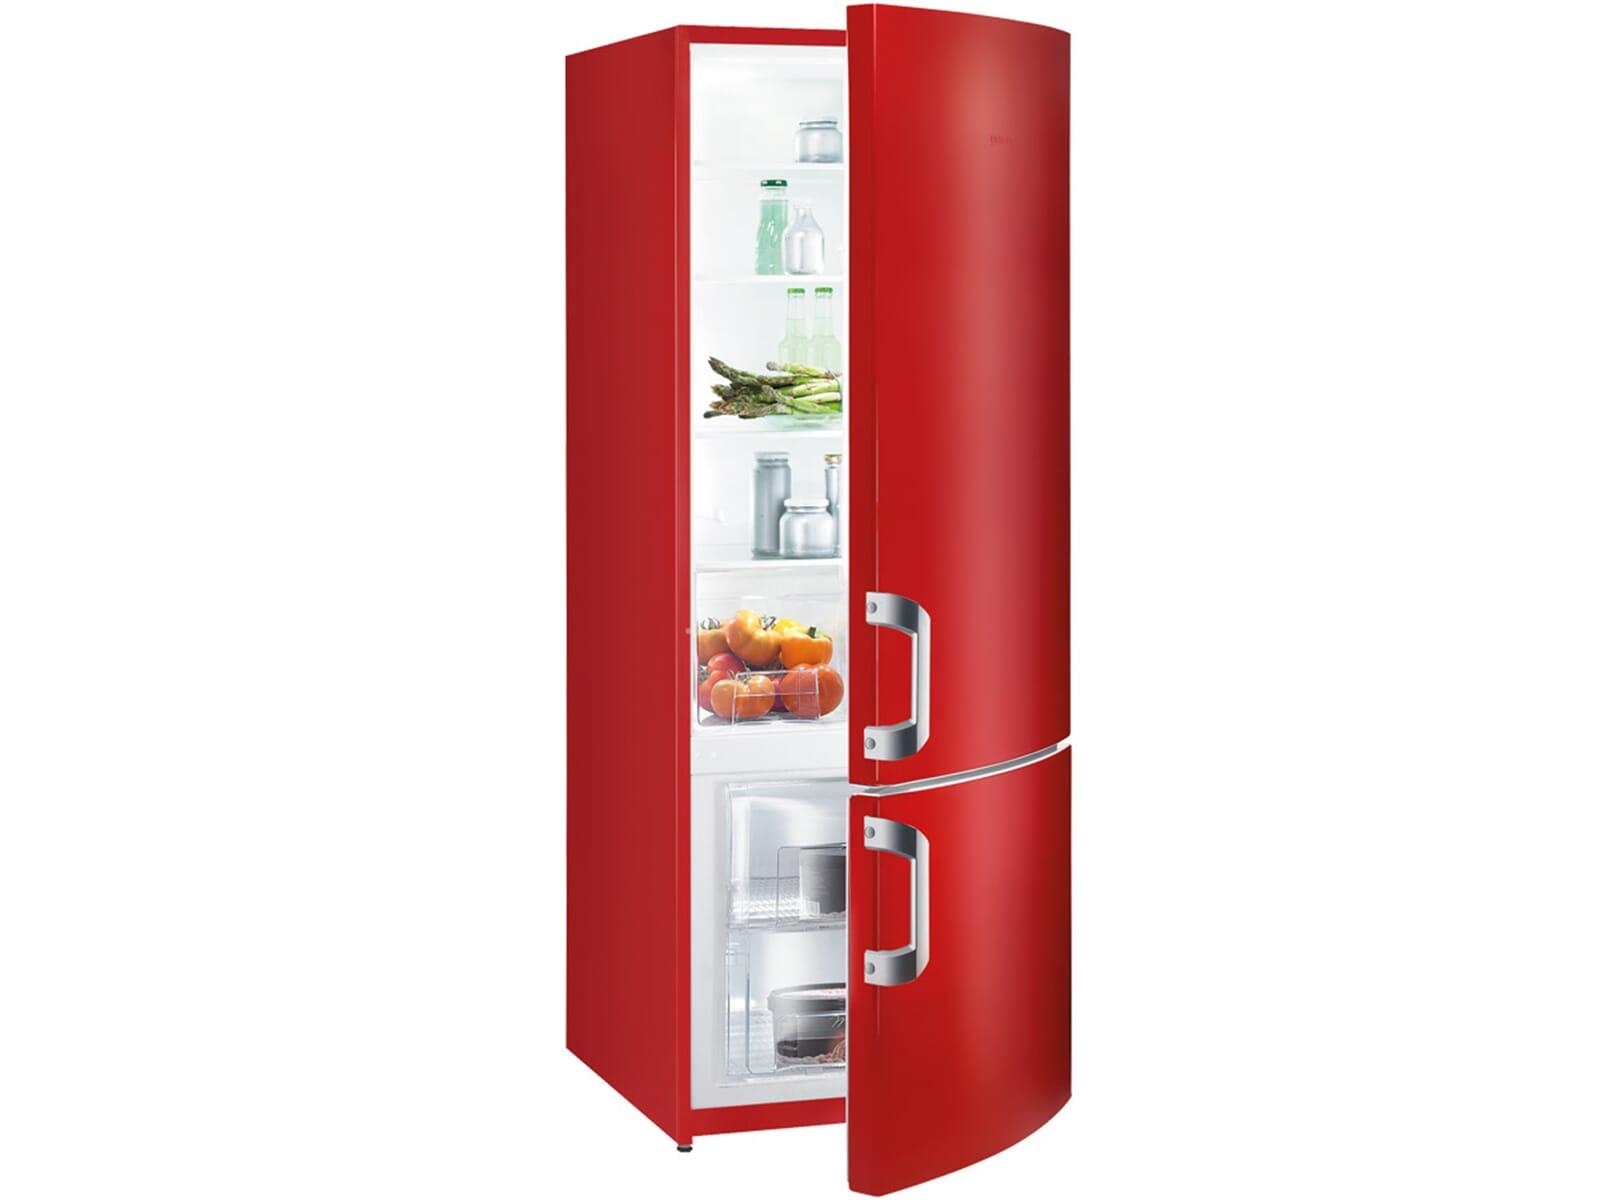 Gorenje Kühlschrank Grün : Gorenje kühlschrank gefrierkombination gorenje rk 60319 or l kühl